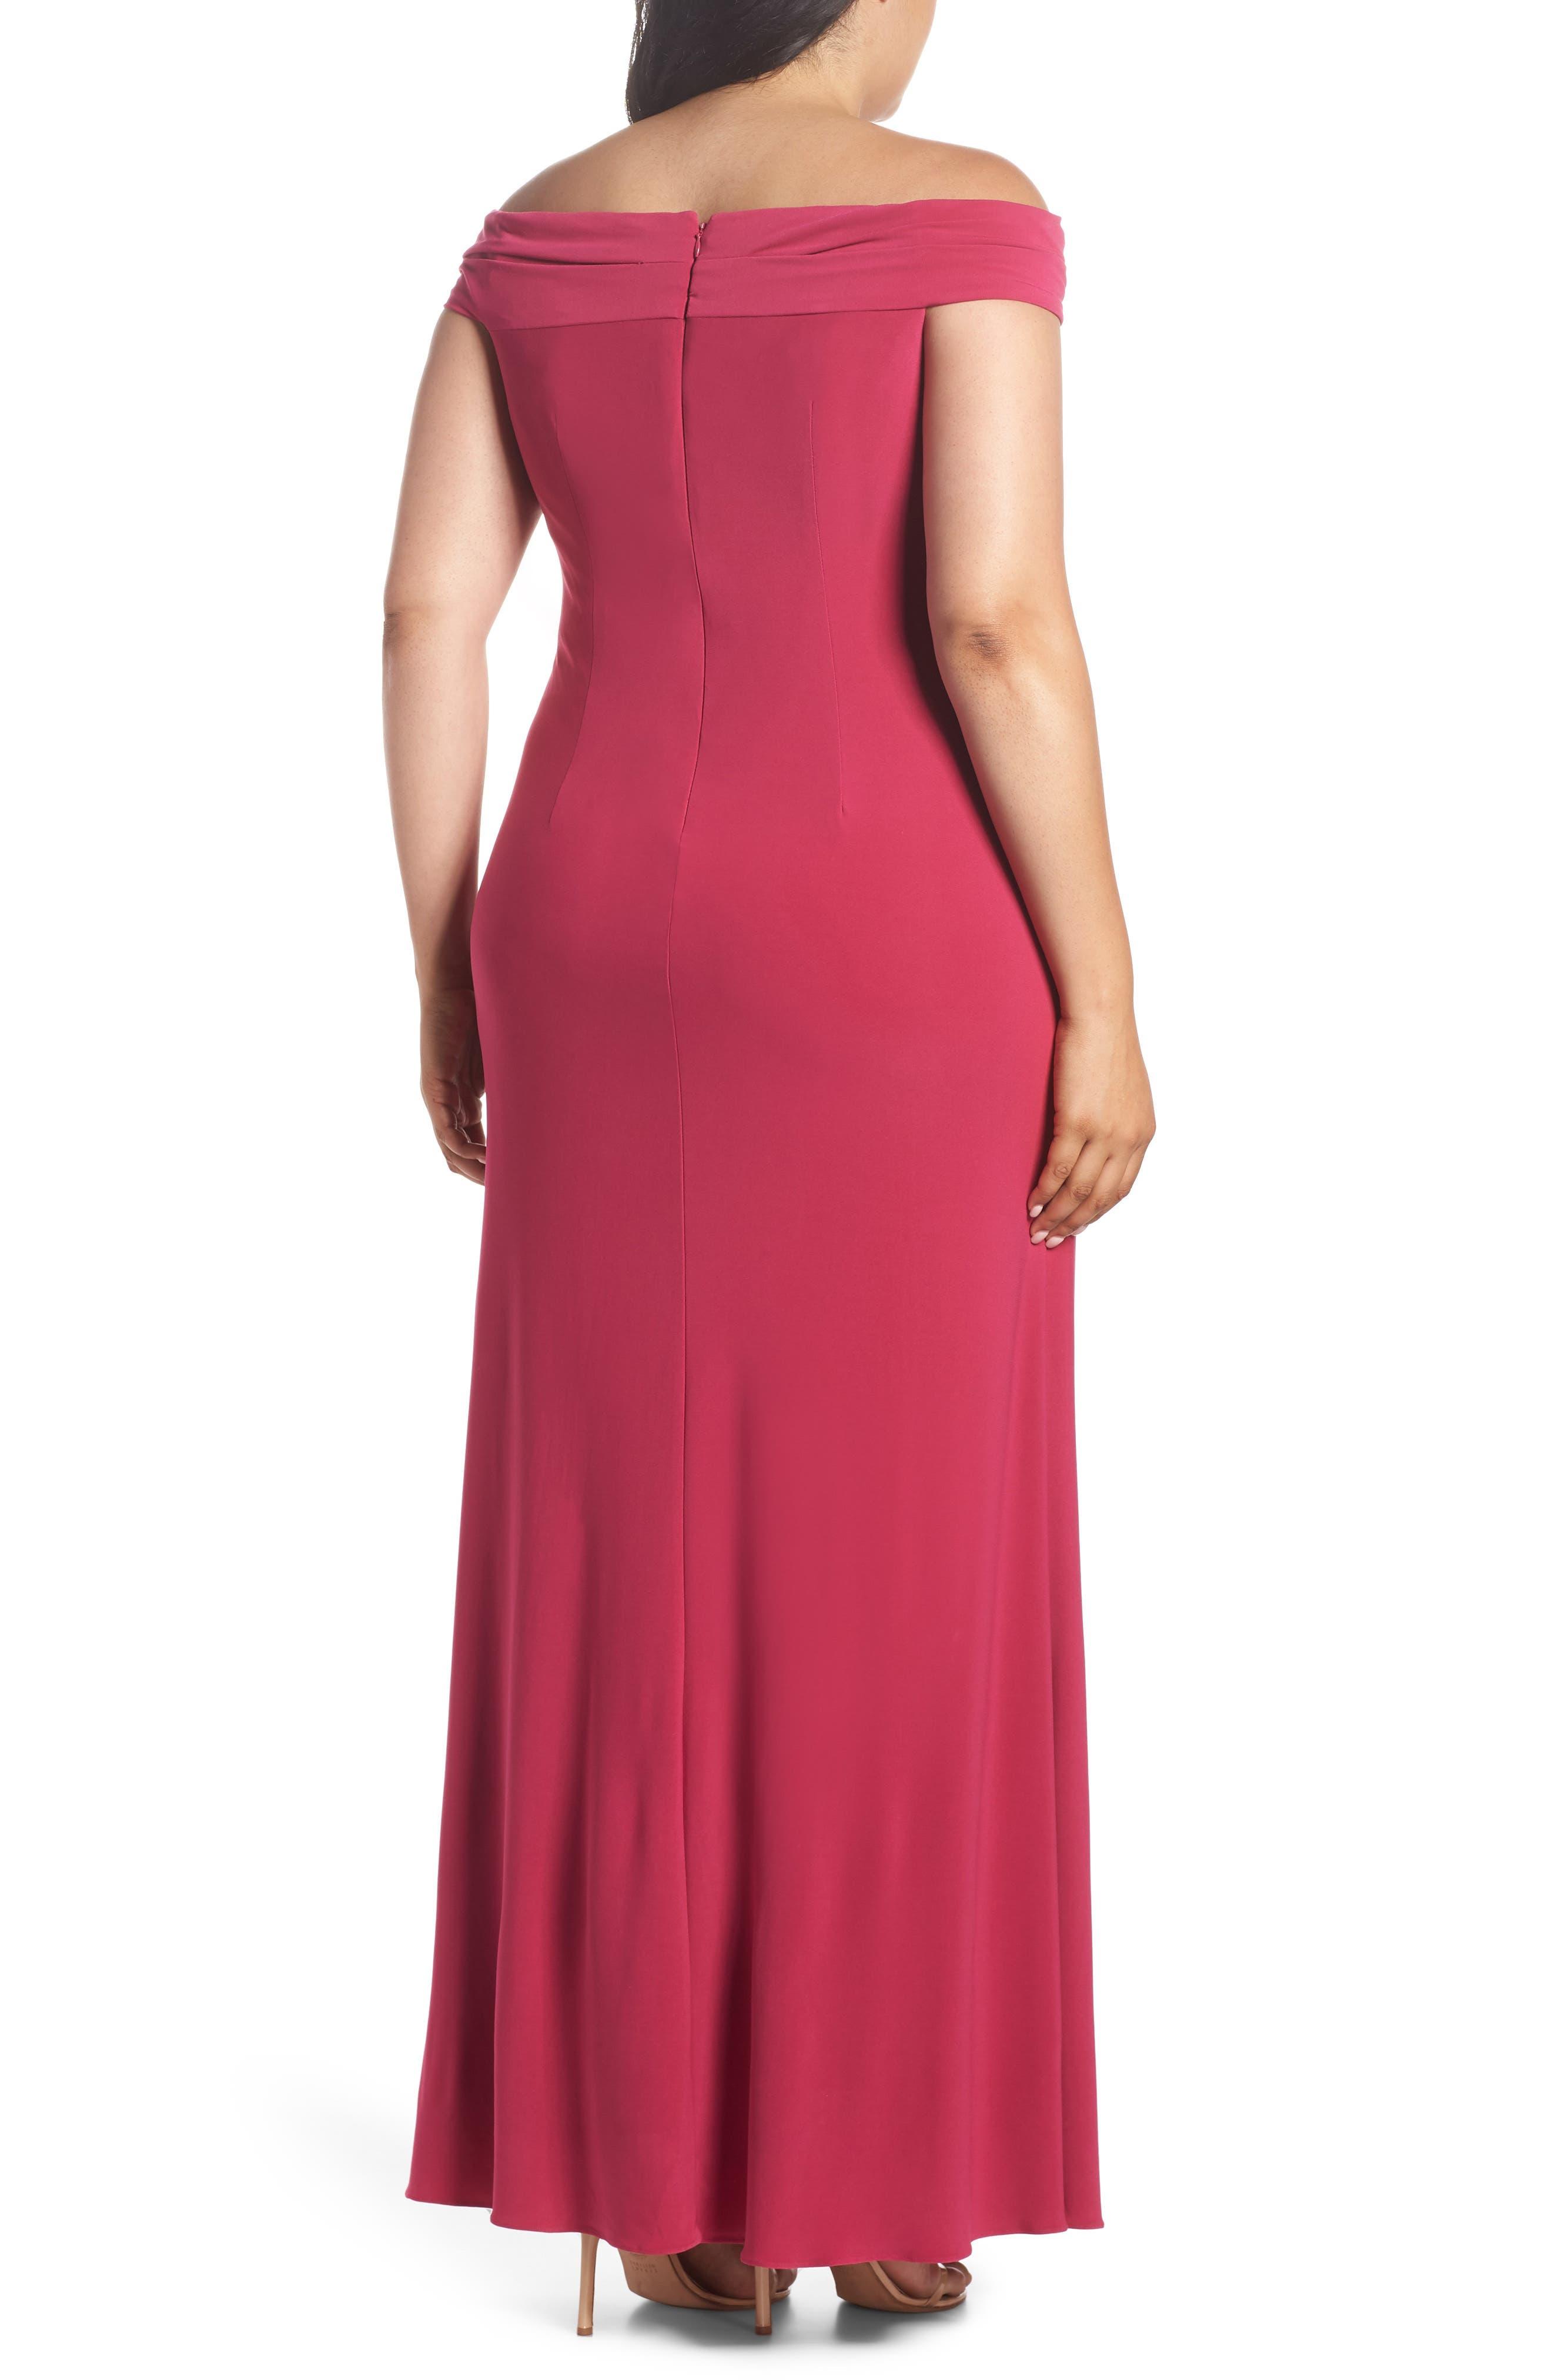 Off the Shoulder Jersey Dress,                             Alternate thumbnail 2, color,                             Bright Syrah